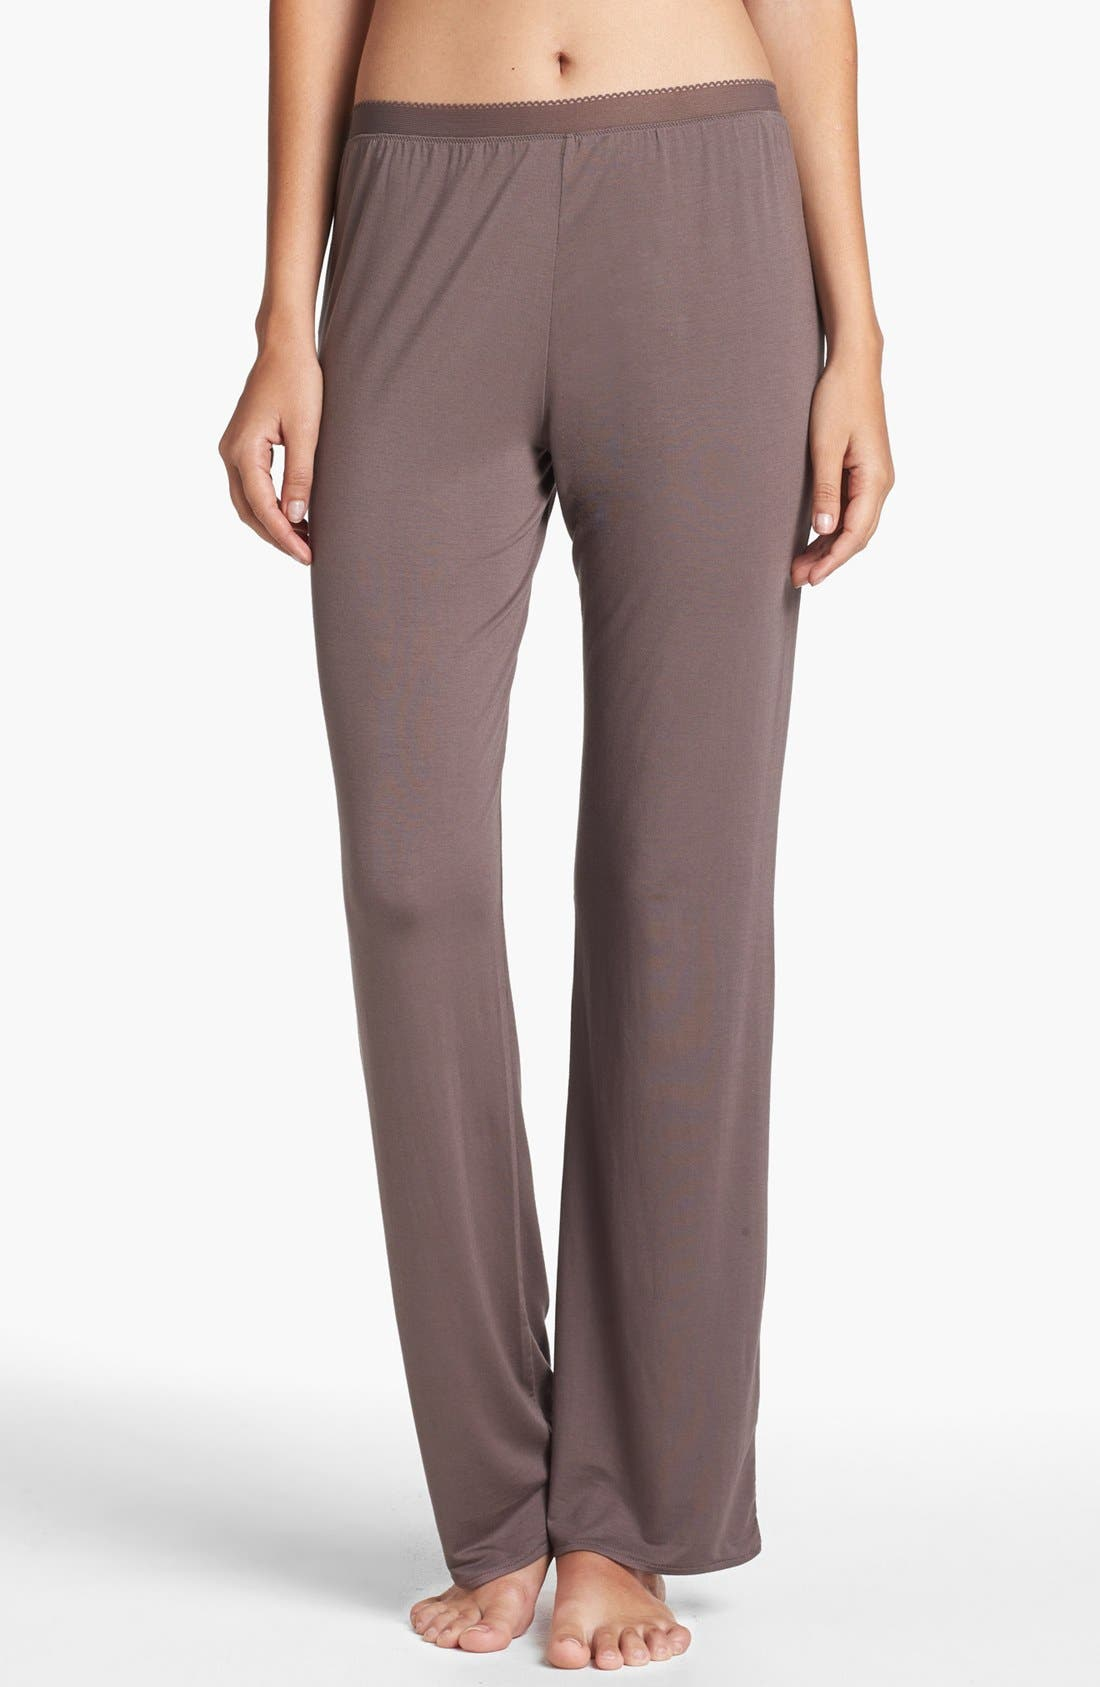 Alternate Image 1 Selected - Calvin Klein 'Icon' Pajama Pants